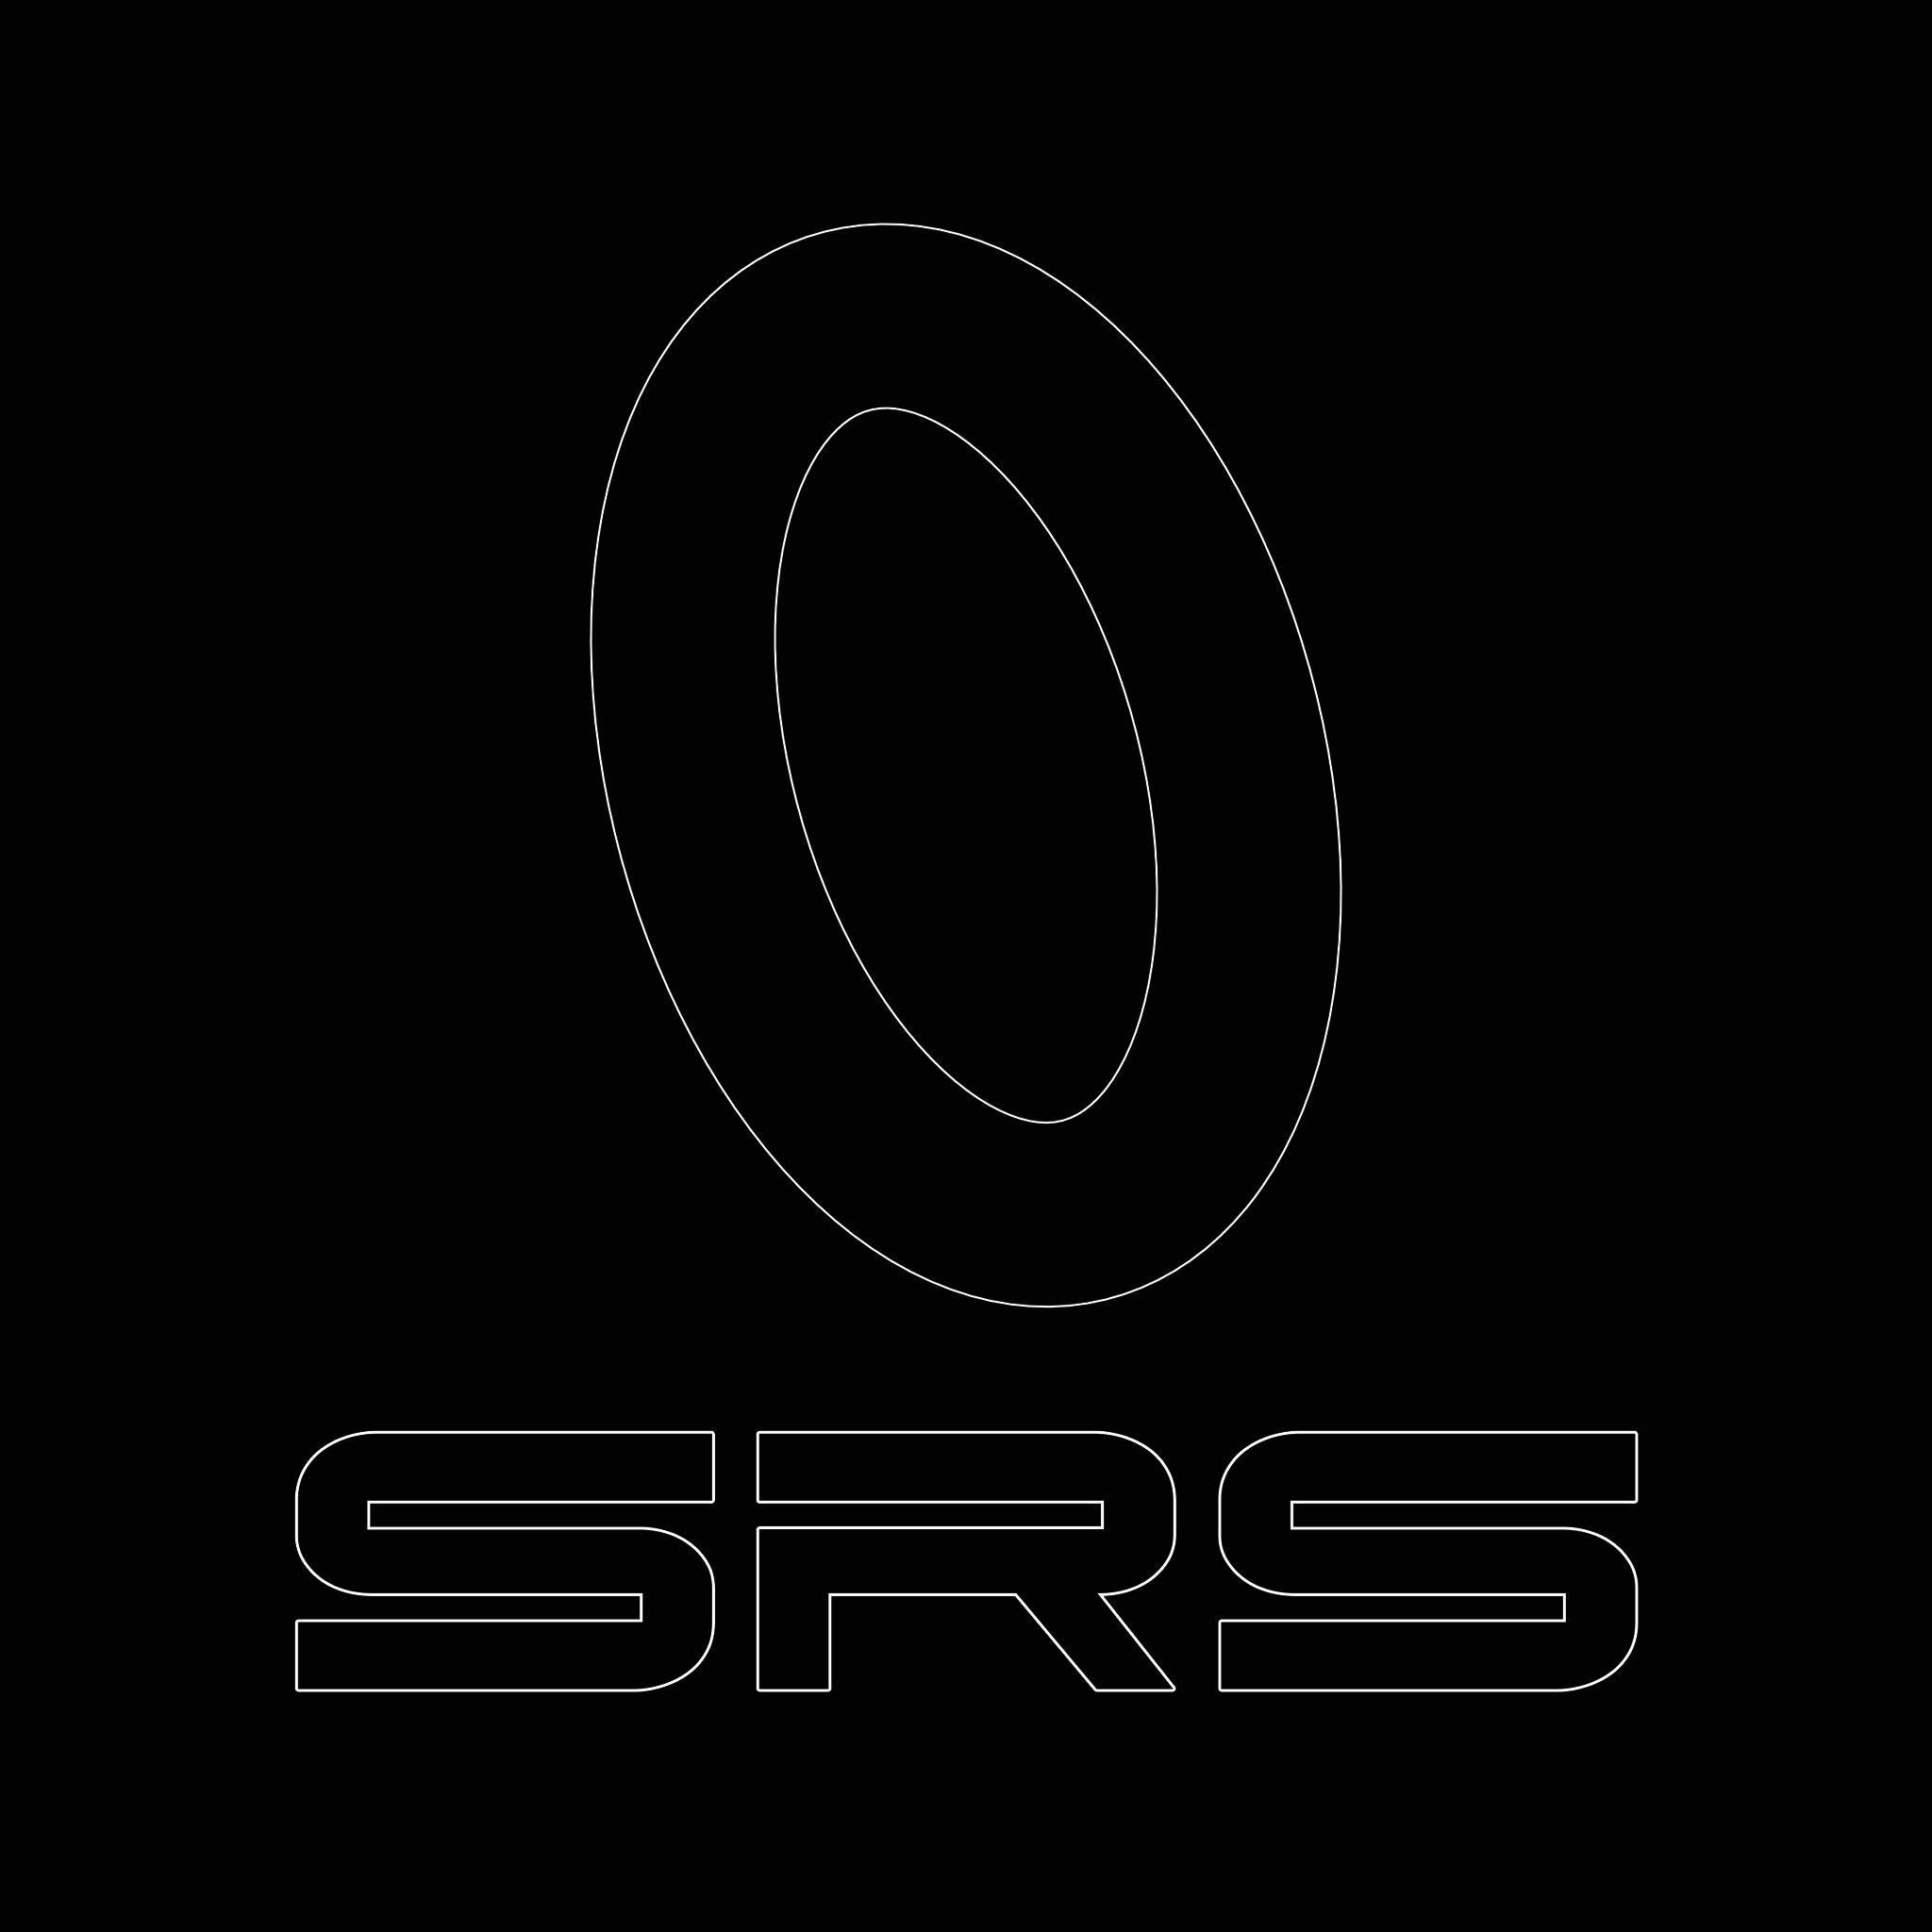 Silverback SRS/HTI Hop-up O-ring set 5.8 X 0.75 mm (10)